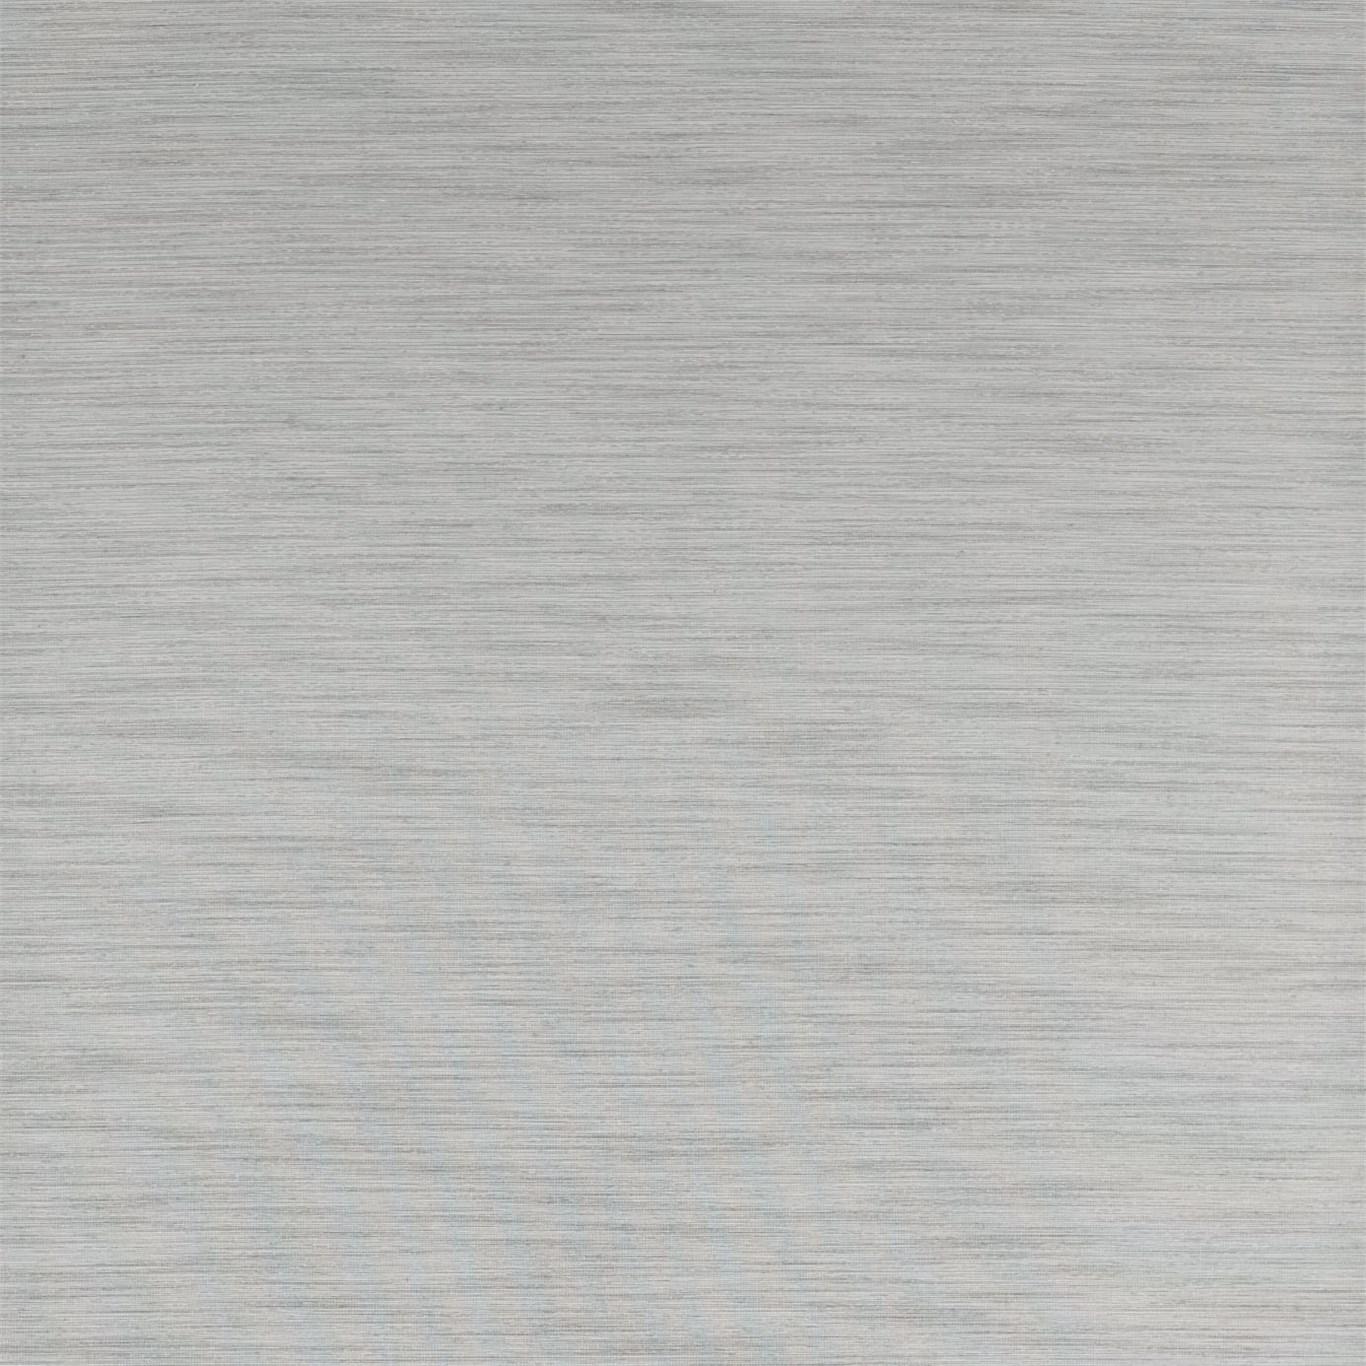 Английские обои Zoffany,  коллекция Akaishi, артикул312494